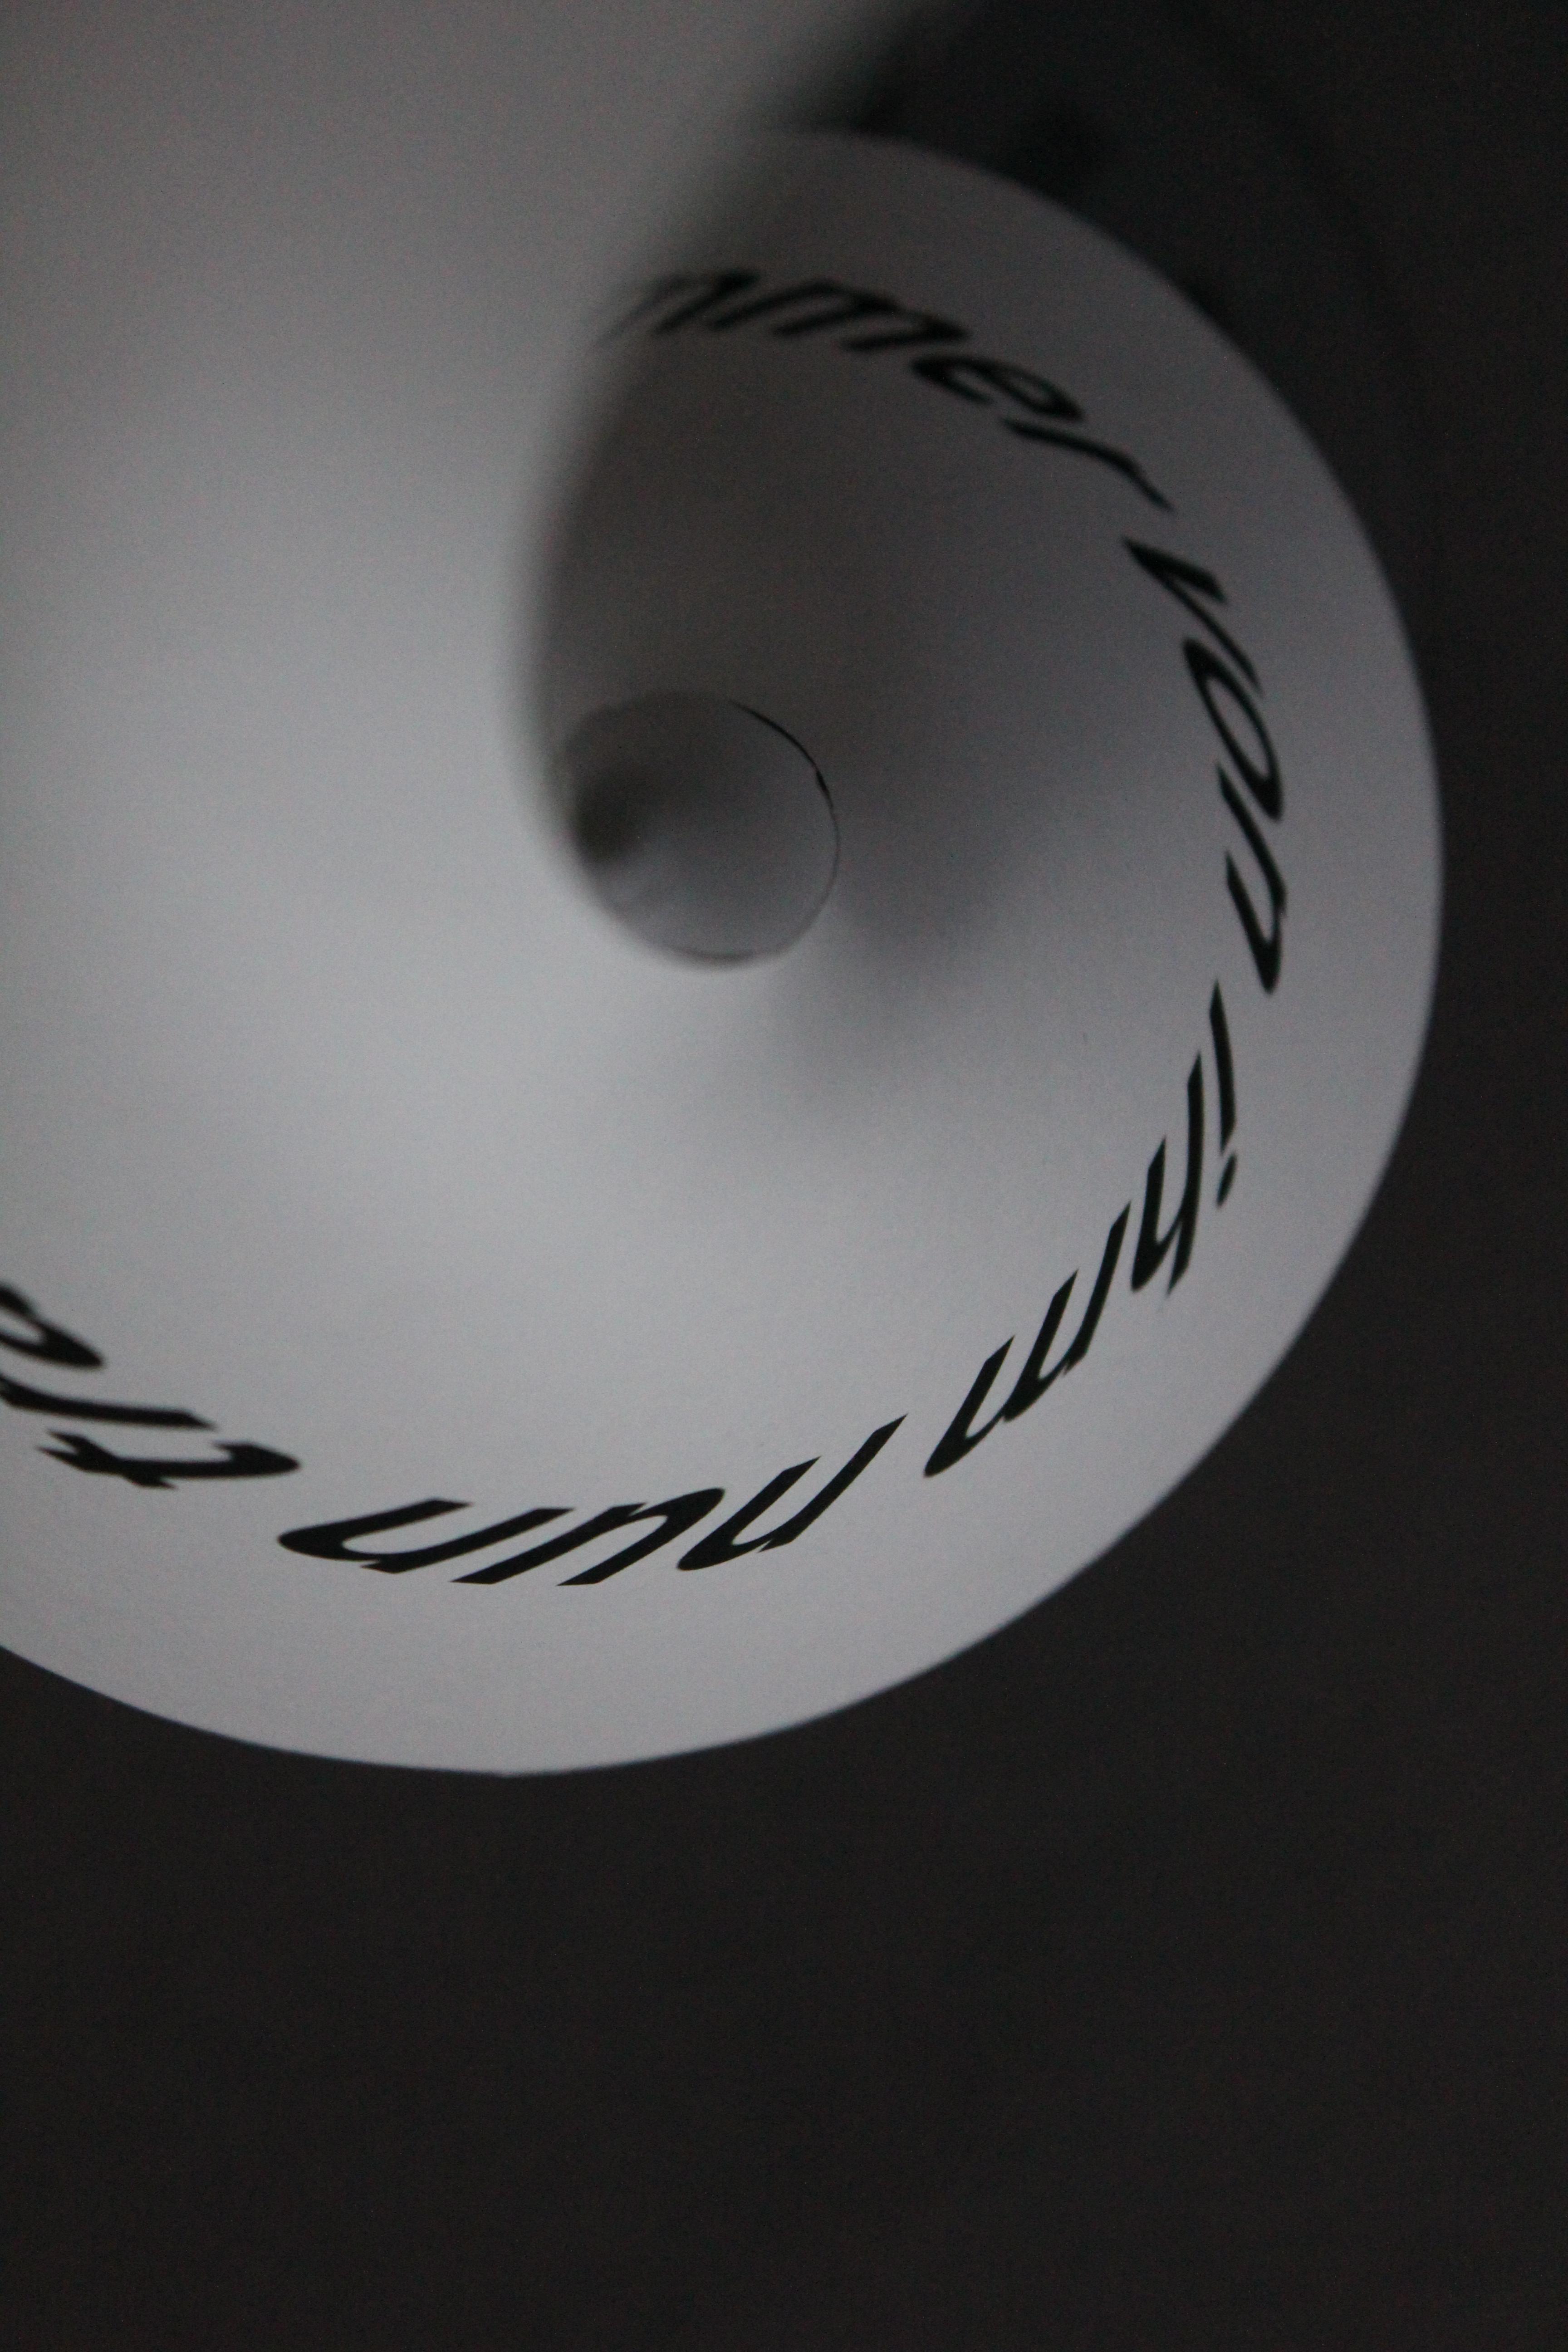 Papier Installationen, Event-Design, Deckenabhängung, individuell bedruckt